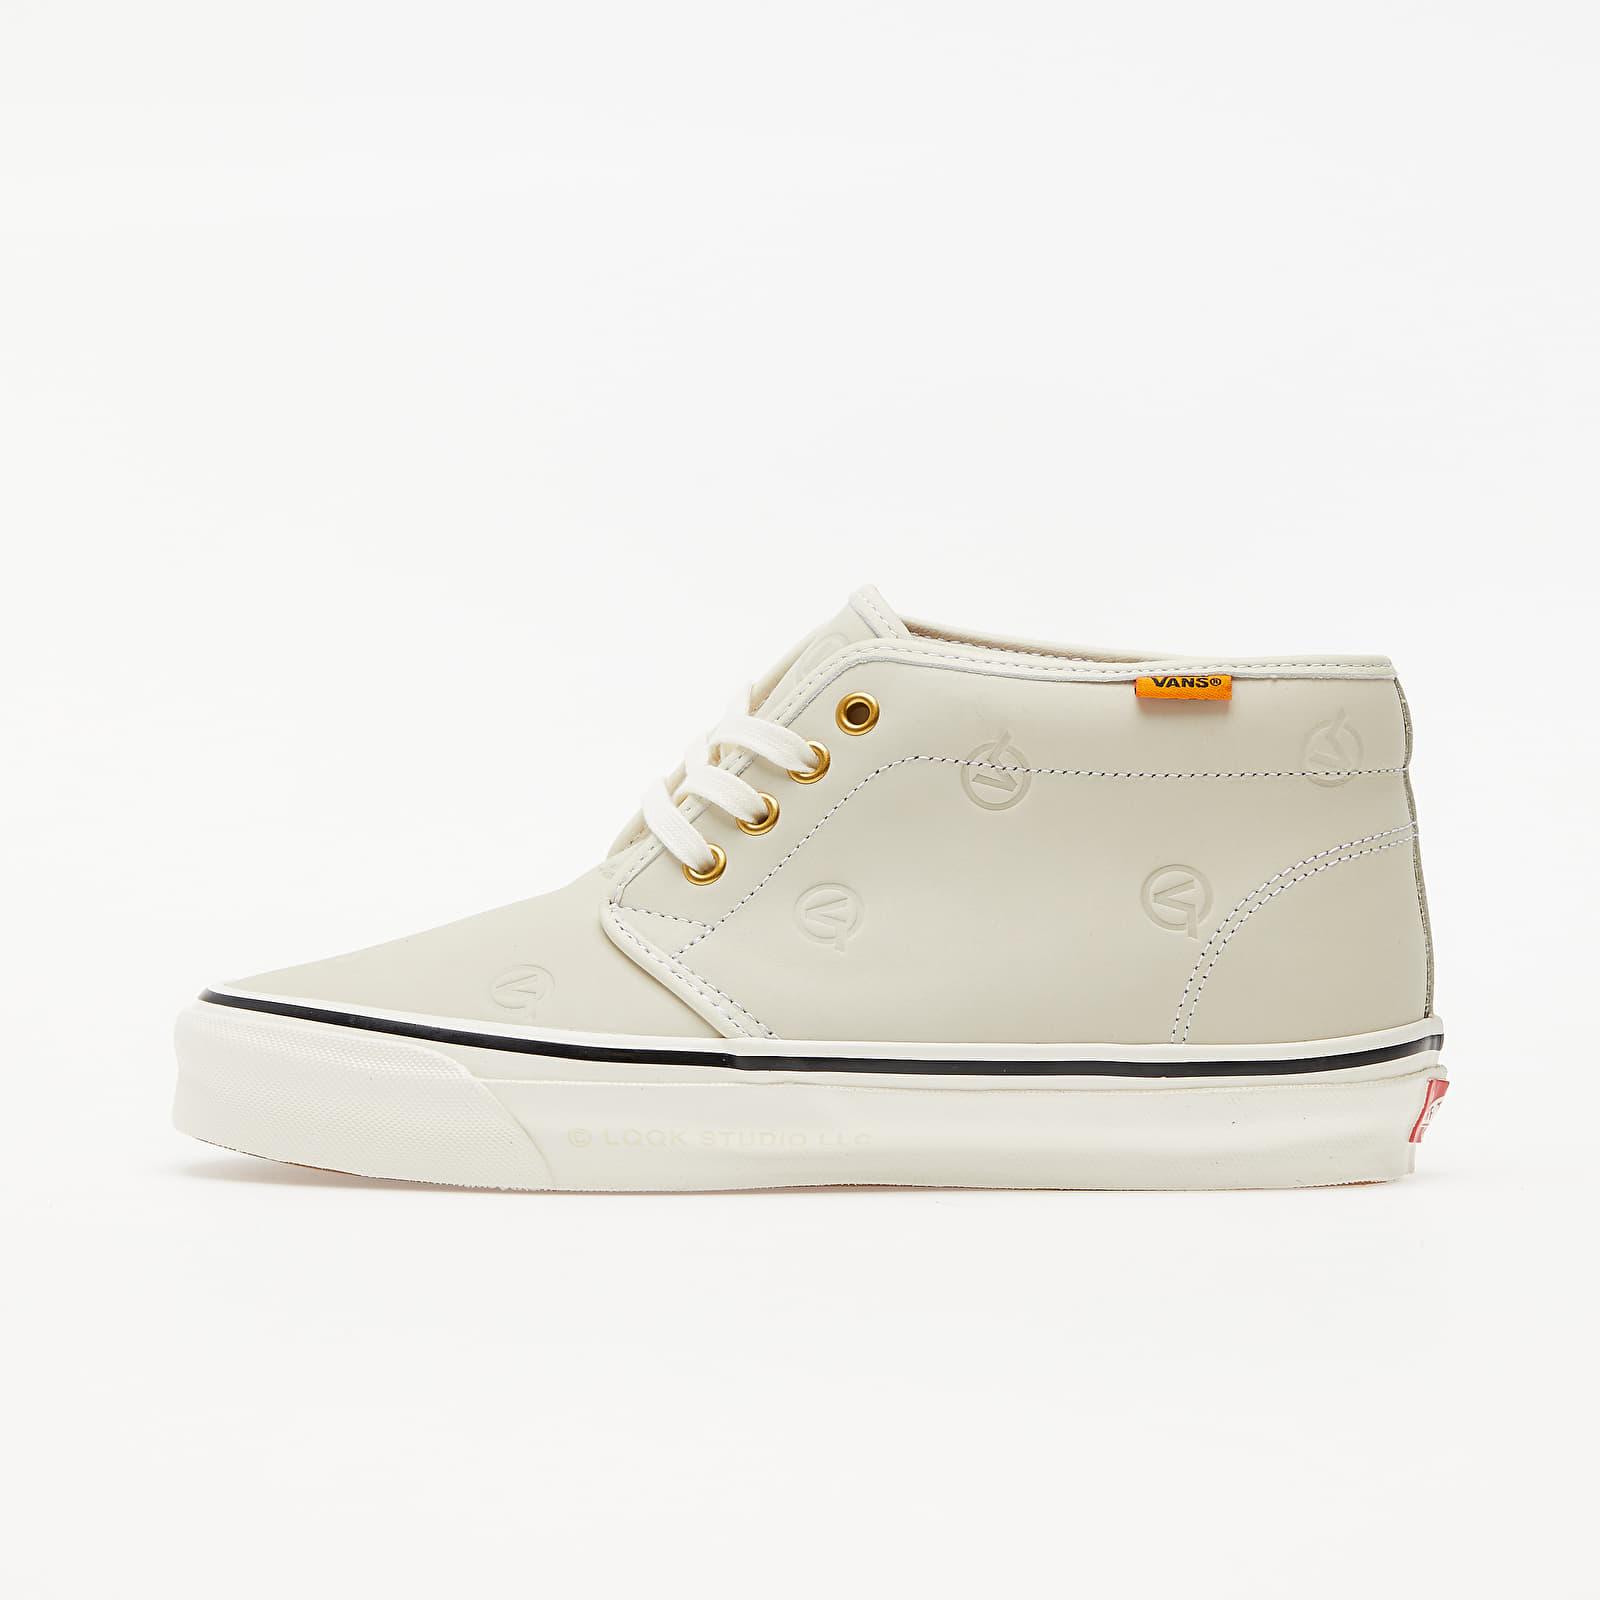 Buty męskie Vans OG Chukka Boot LX (LQQK Studio) Circle V Cream